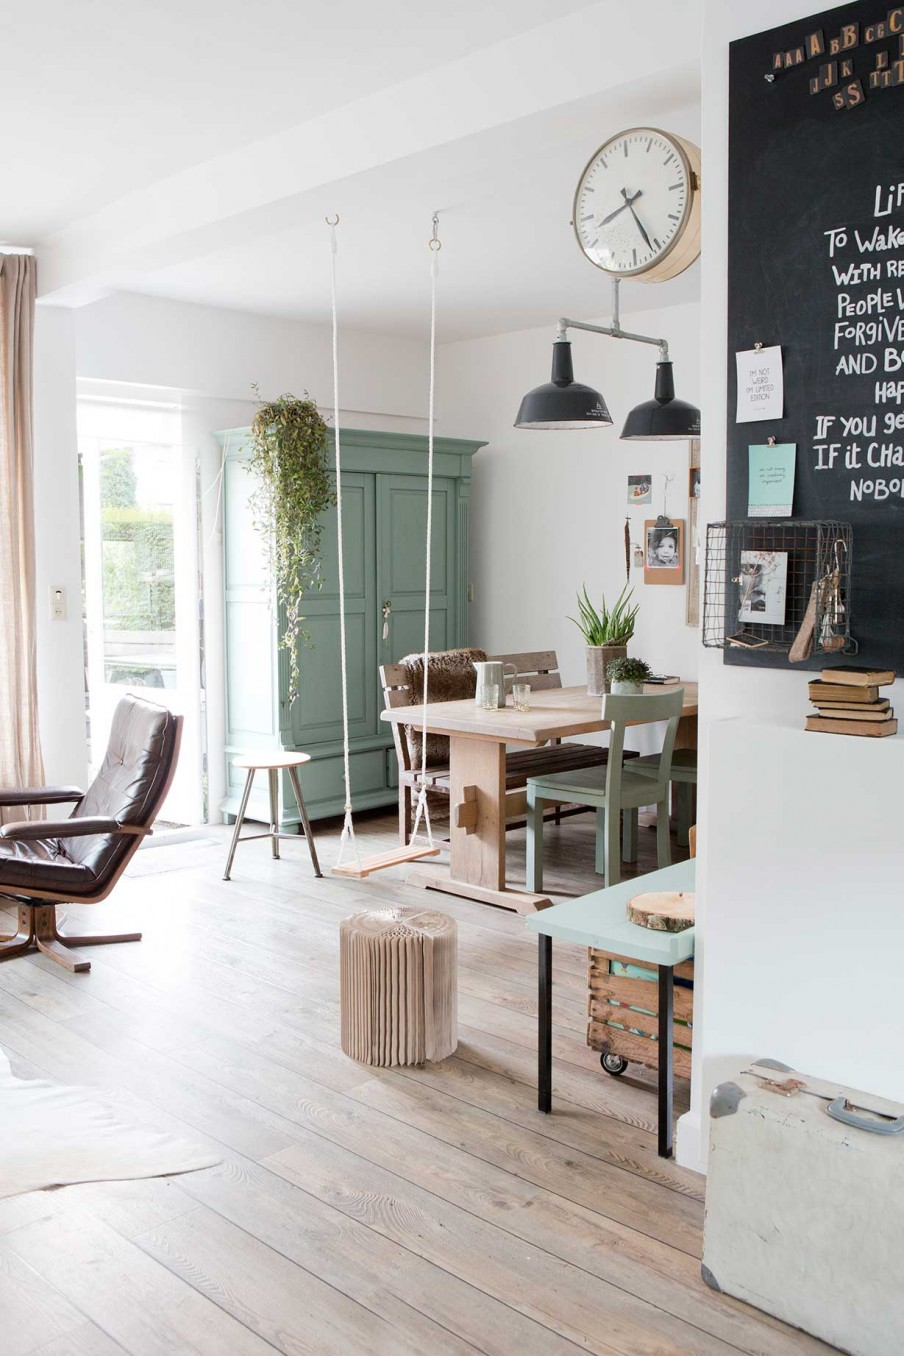 maison-deco-scandinave-brocante-liliinwonderland-1